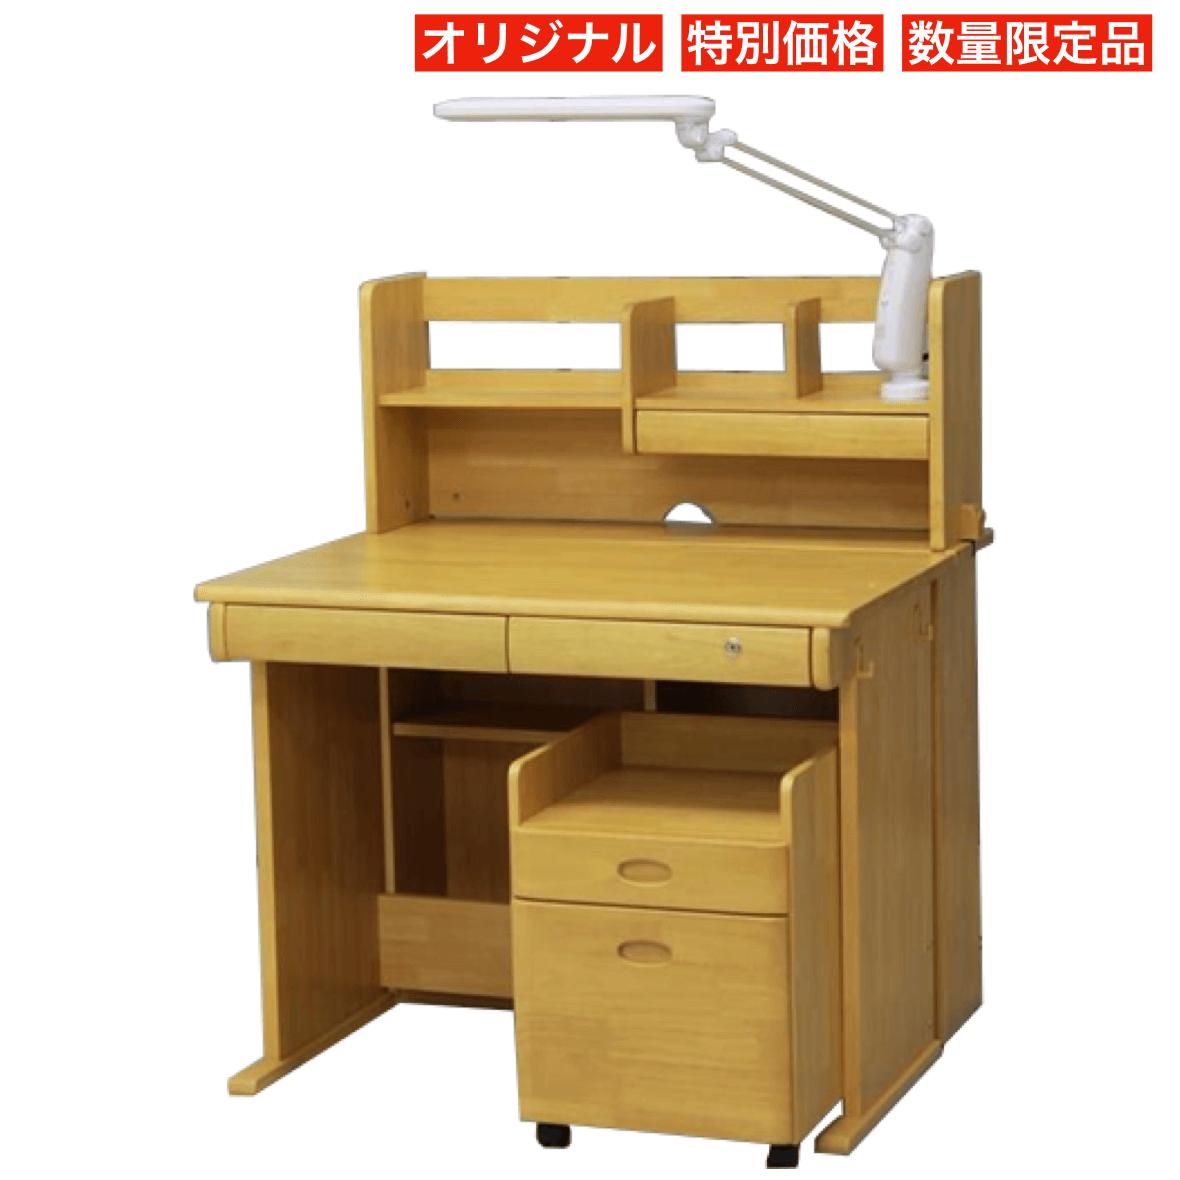 SSWD-517A/YLED15LB-LB3Dデスク【数量限定品】